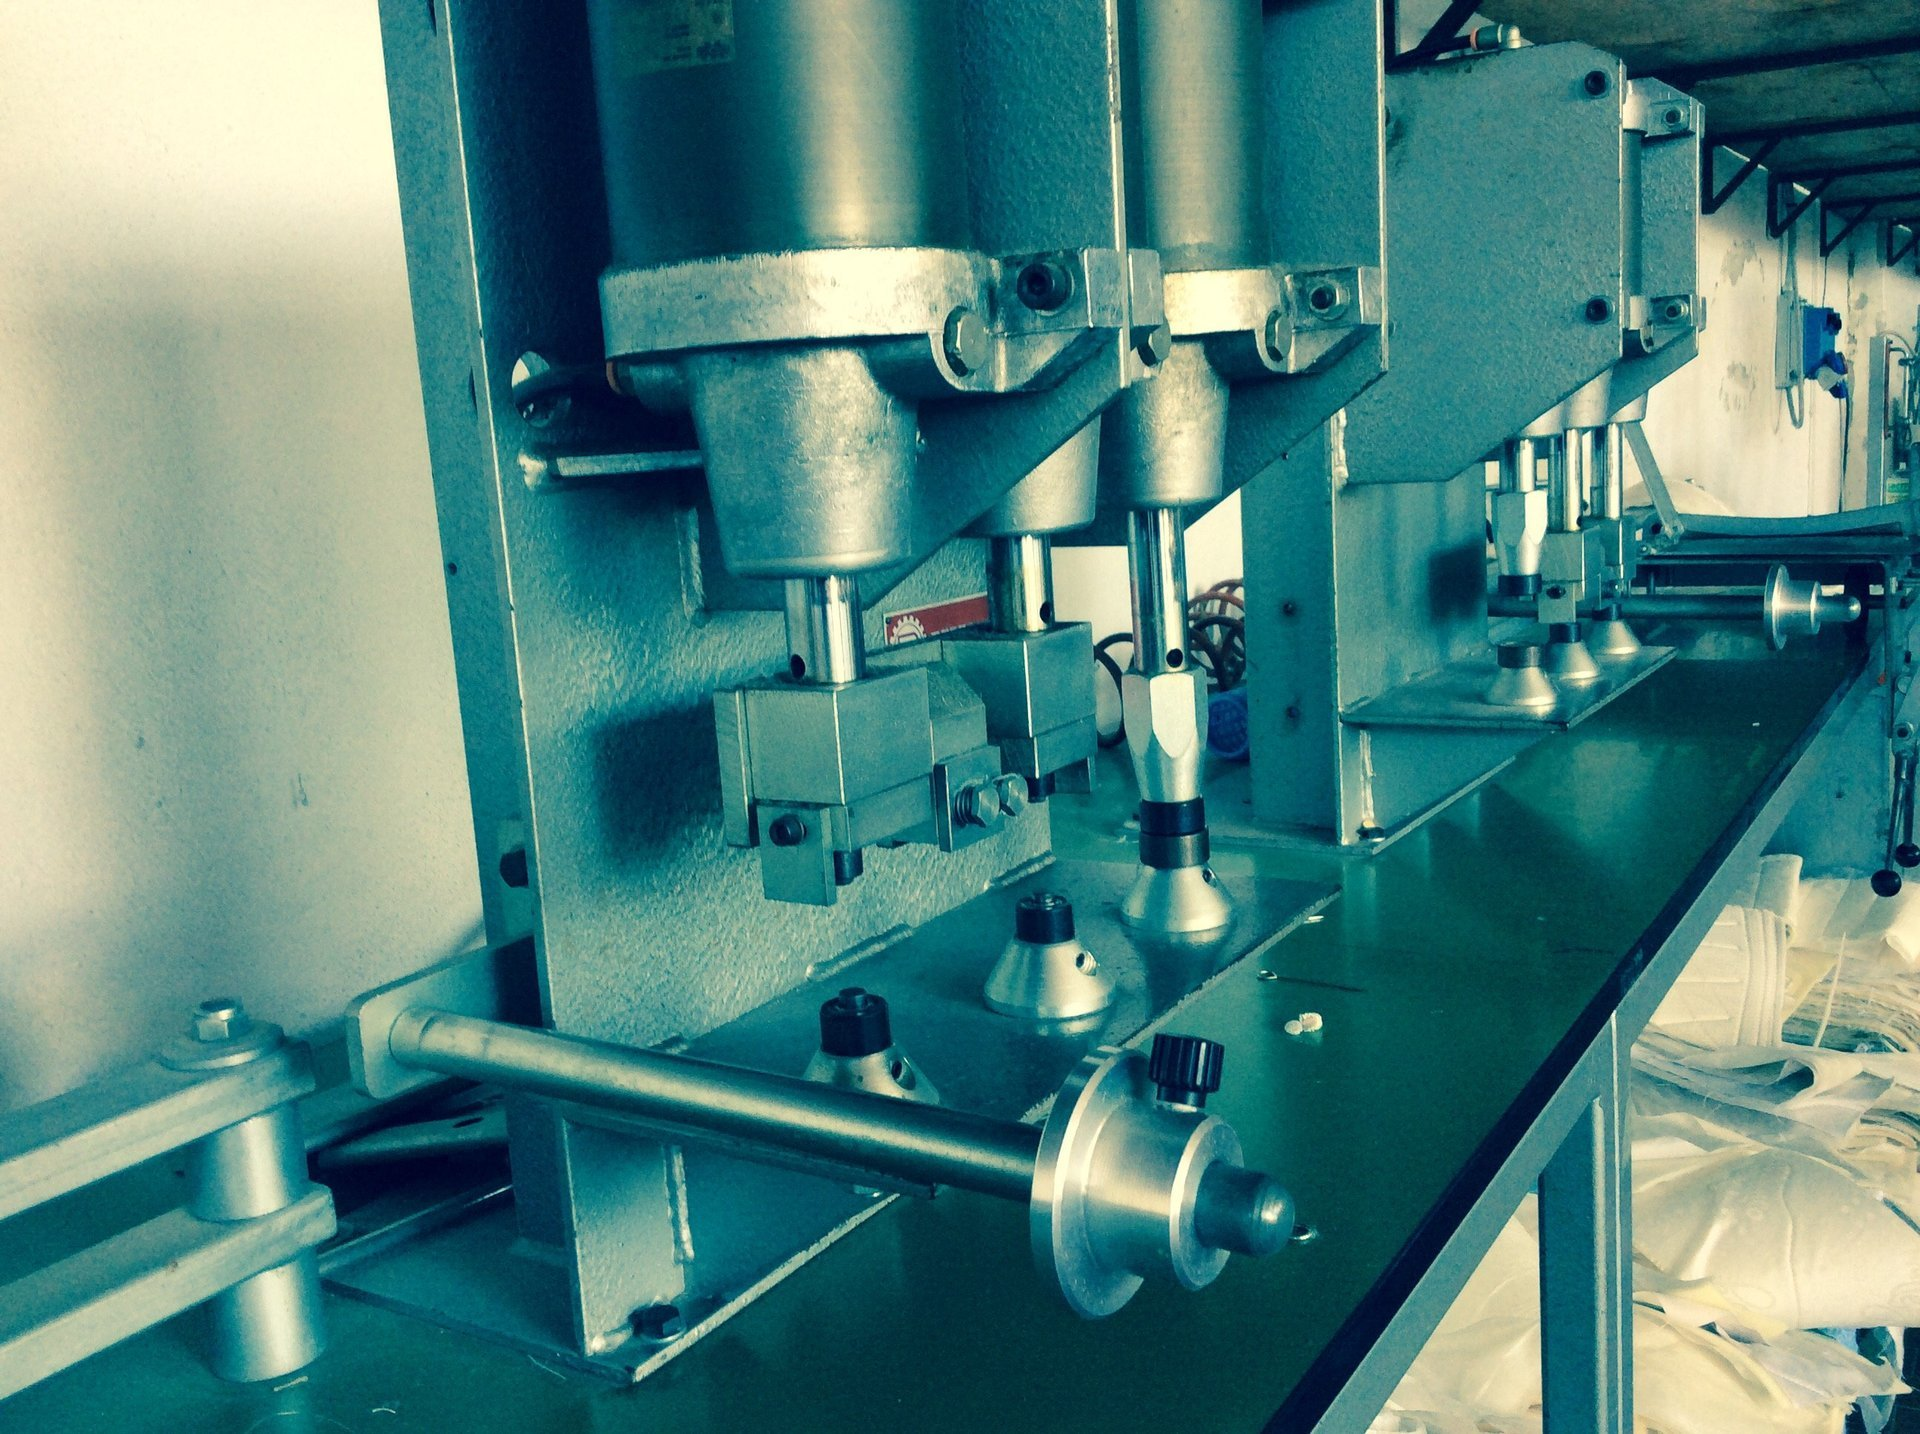 macchinari per produzione materassi